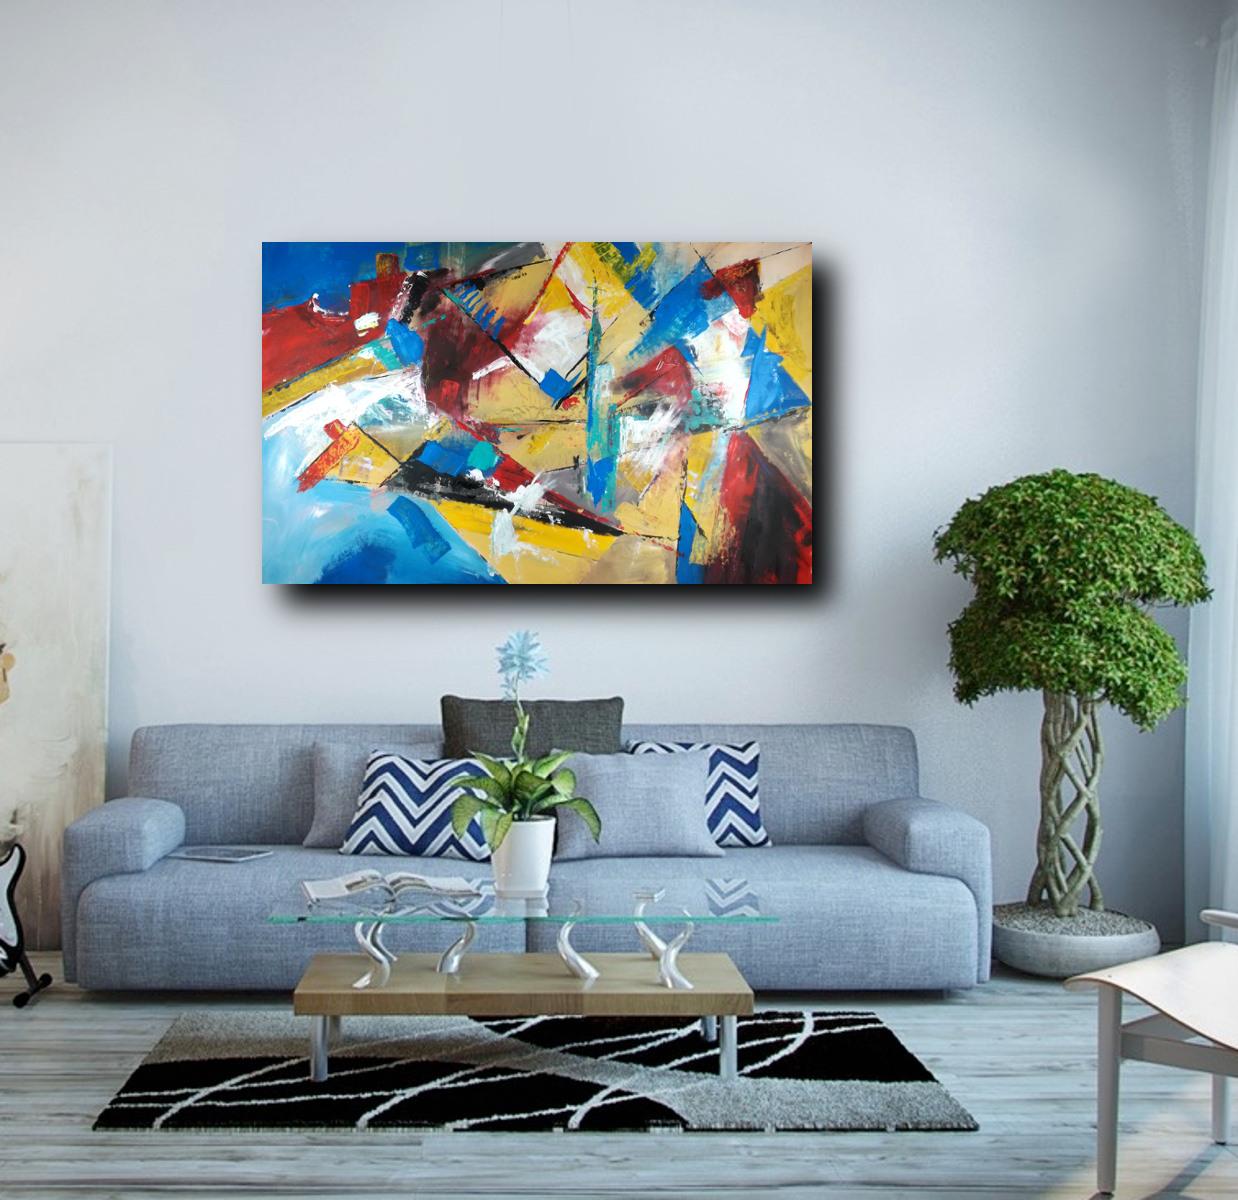 dipinto grande su tela 120x80 per arredamento moderno ...